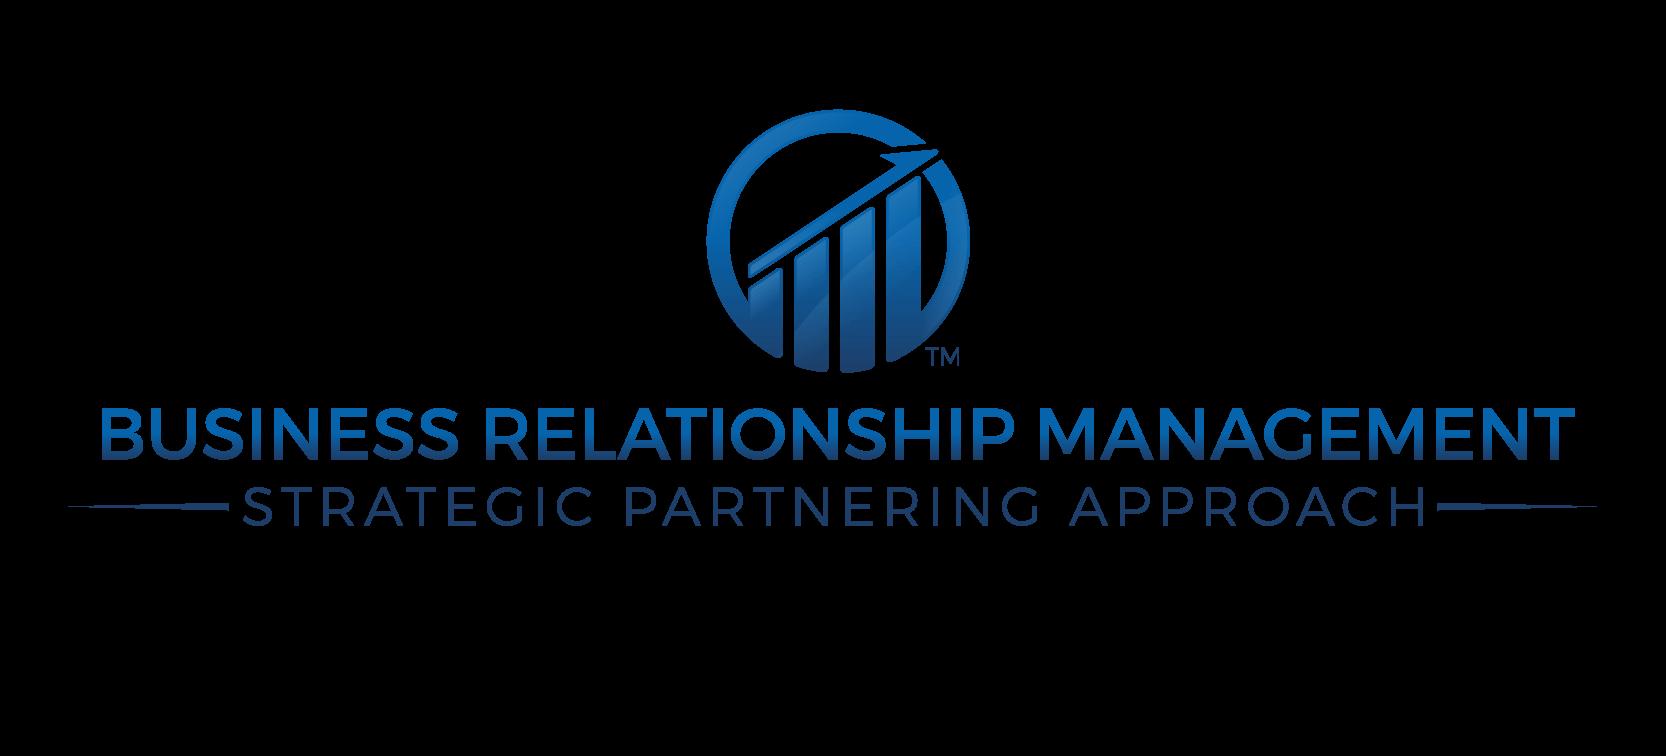 Strategic Partnering Aproach